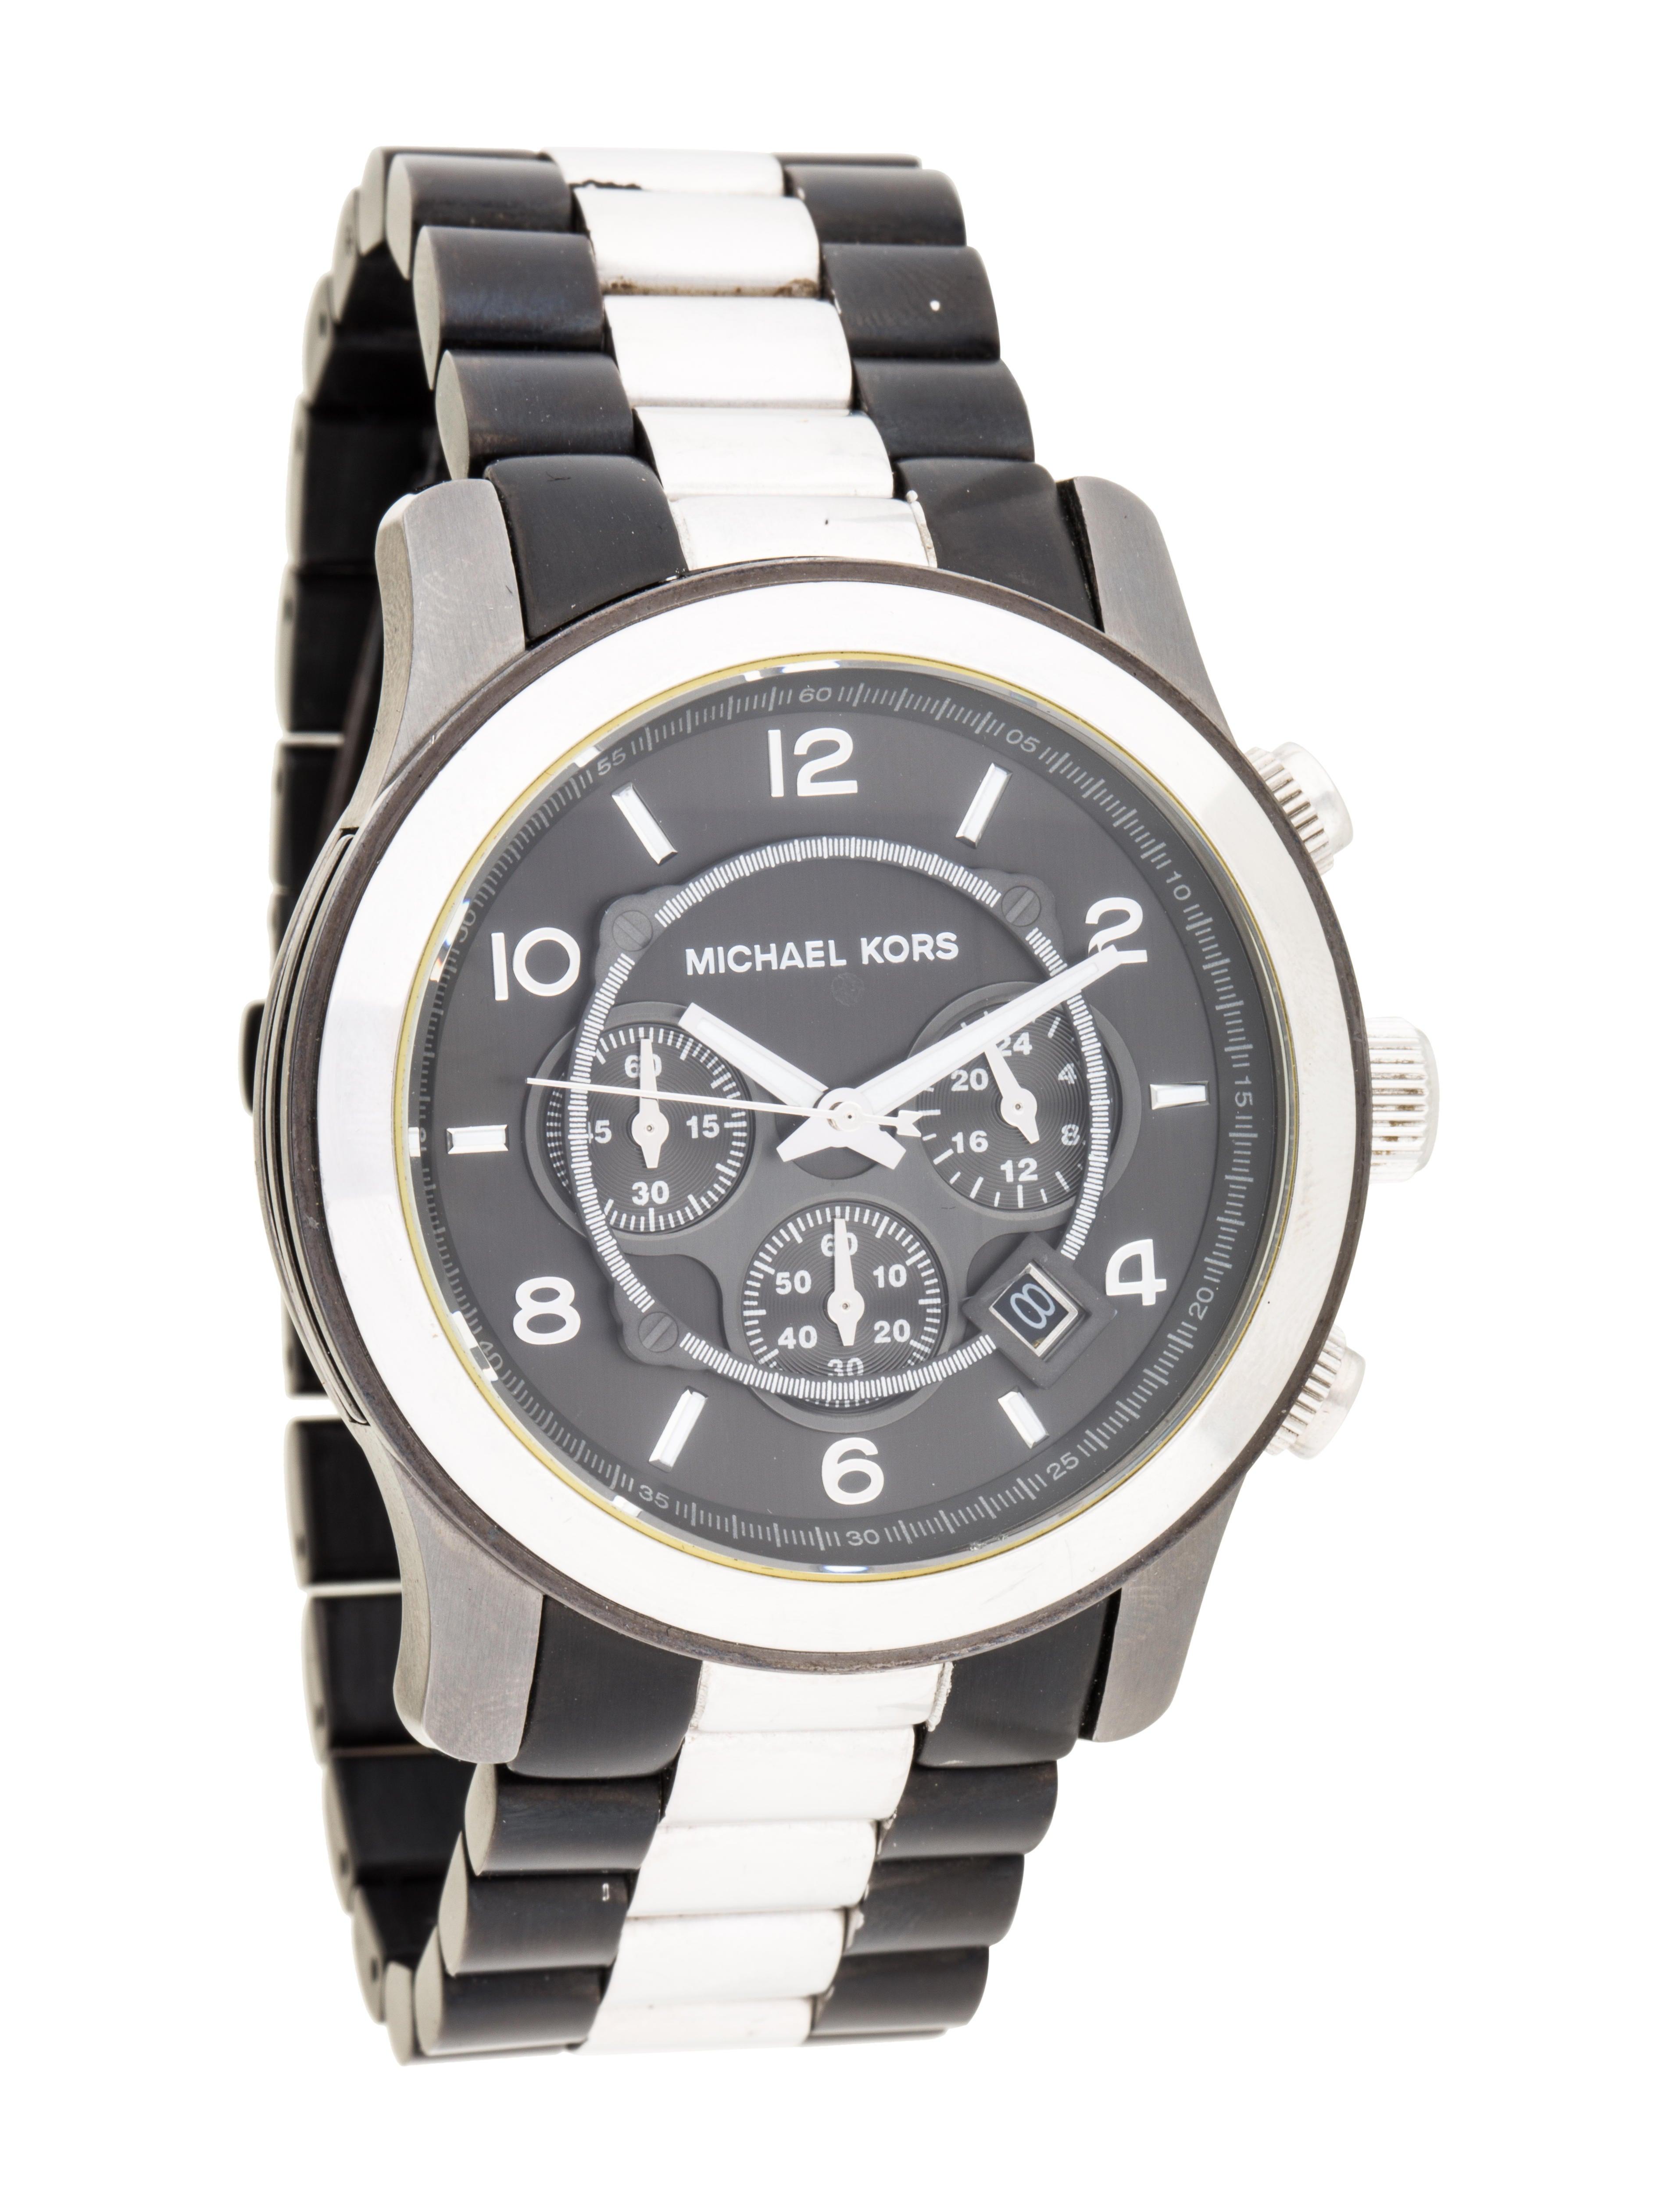 38533984942d Michael Kors Runway Watch - Bracelet - MIC48666